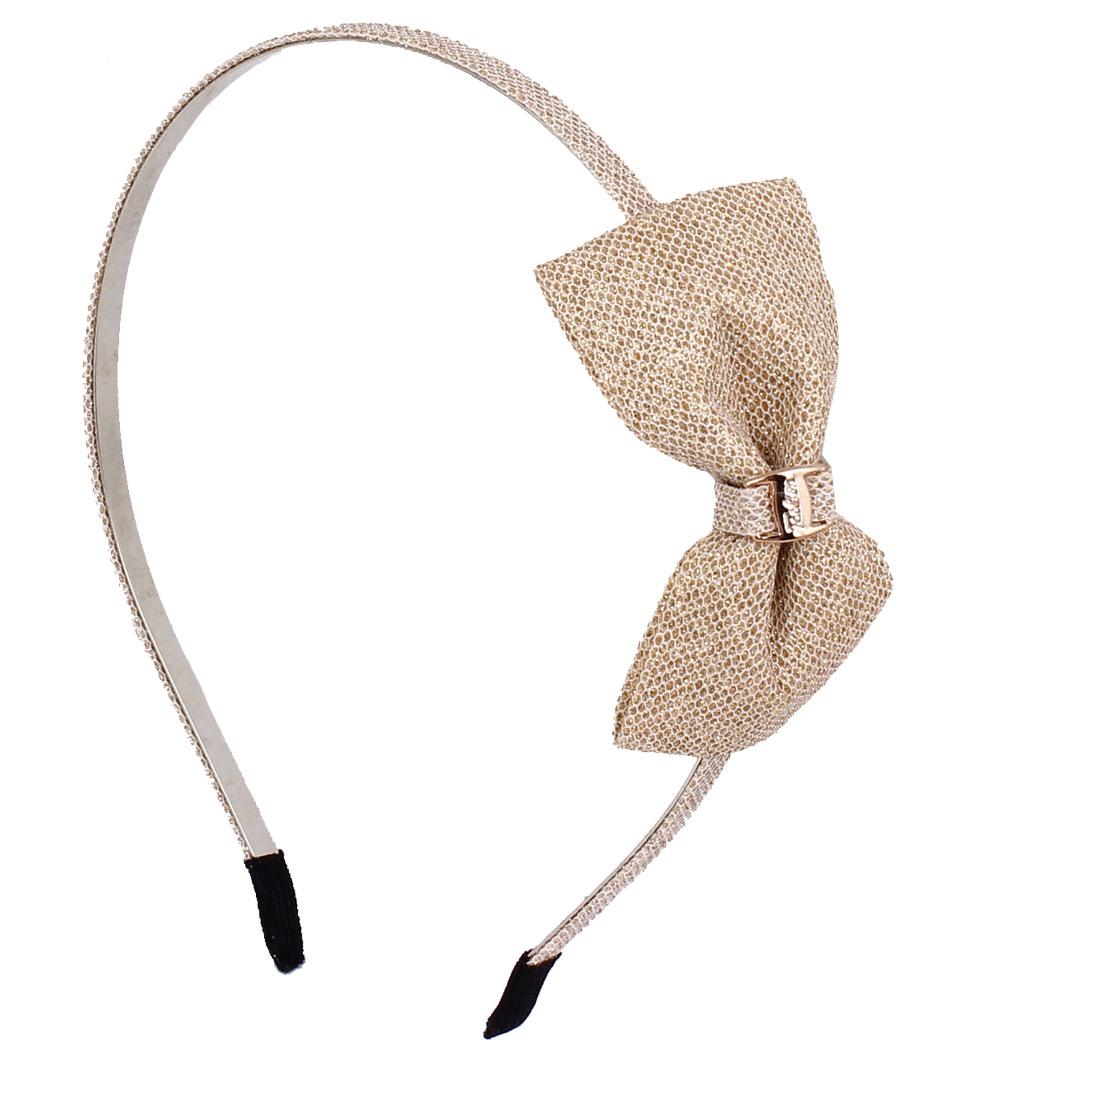 Gold Nylon Bowknot Sparkly Sequin Powder Detail Decor Metal Frame Hair Hoop for Girl